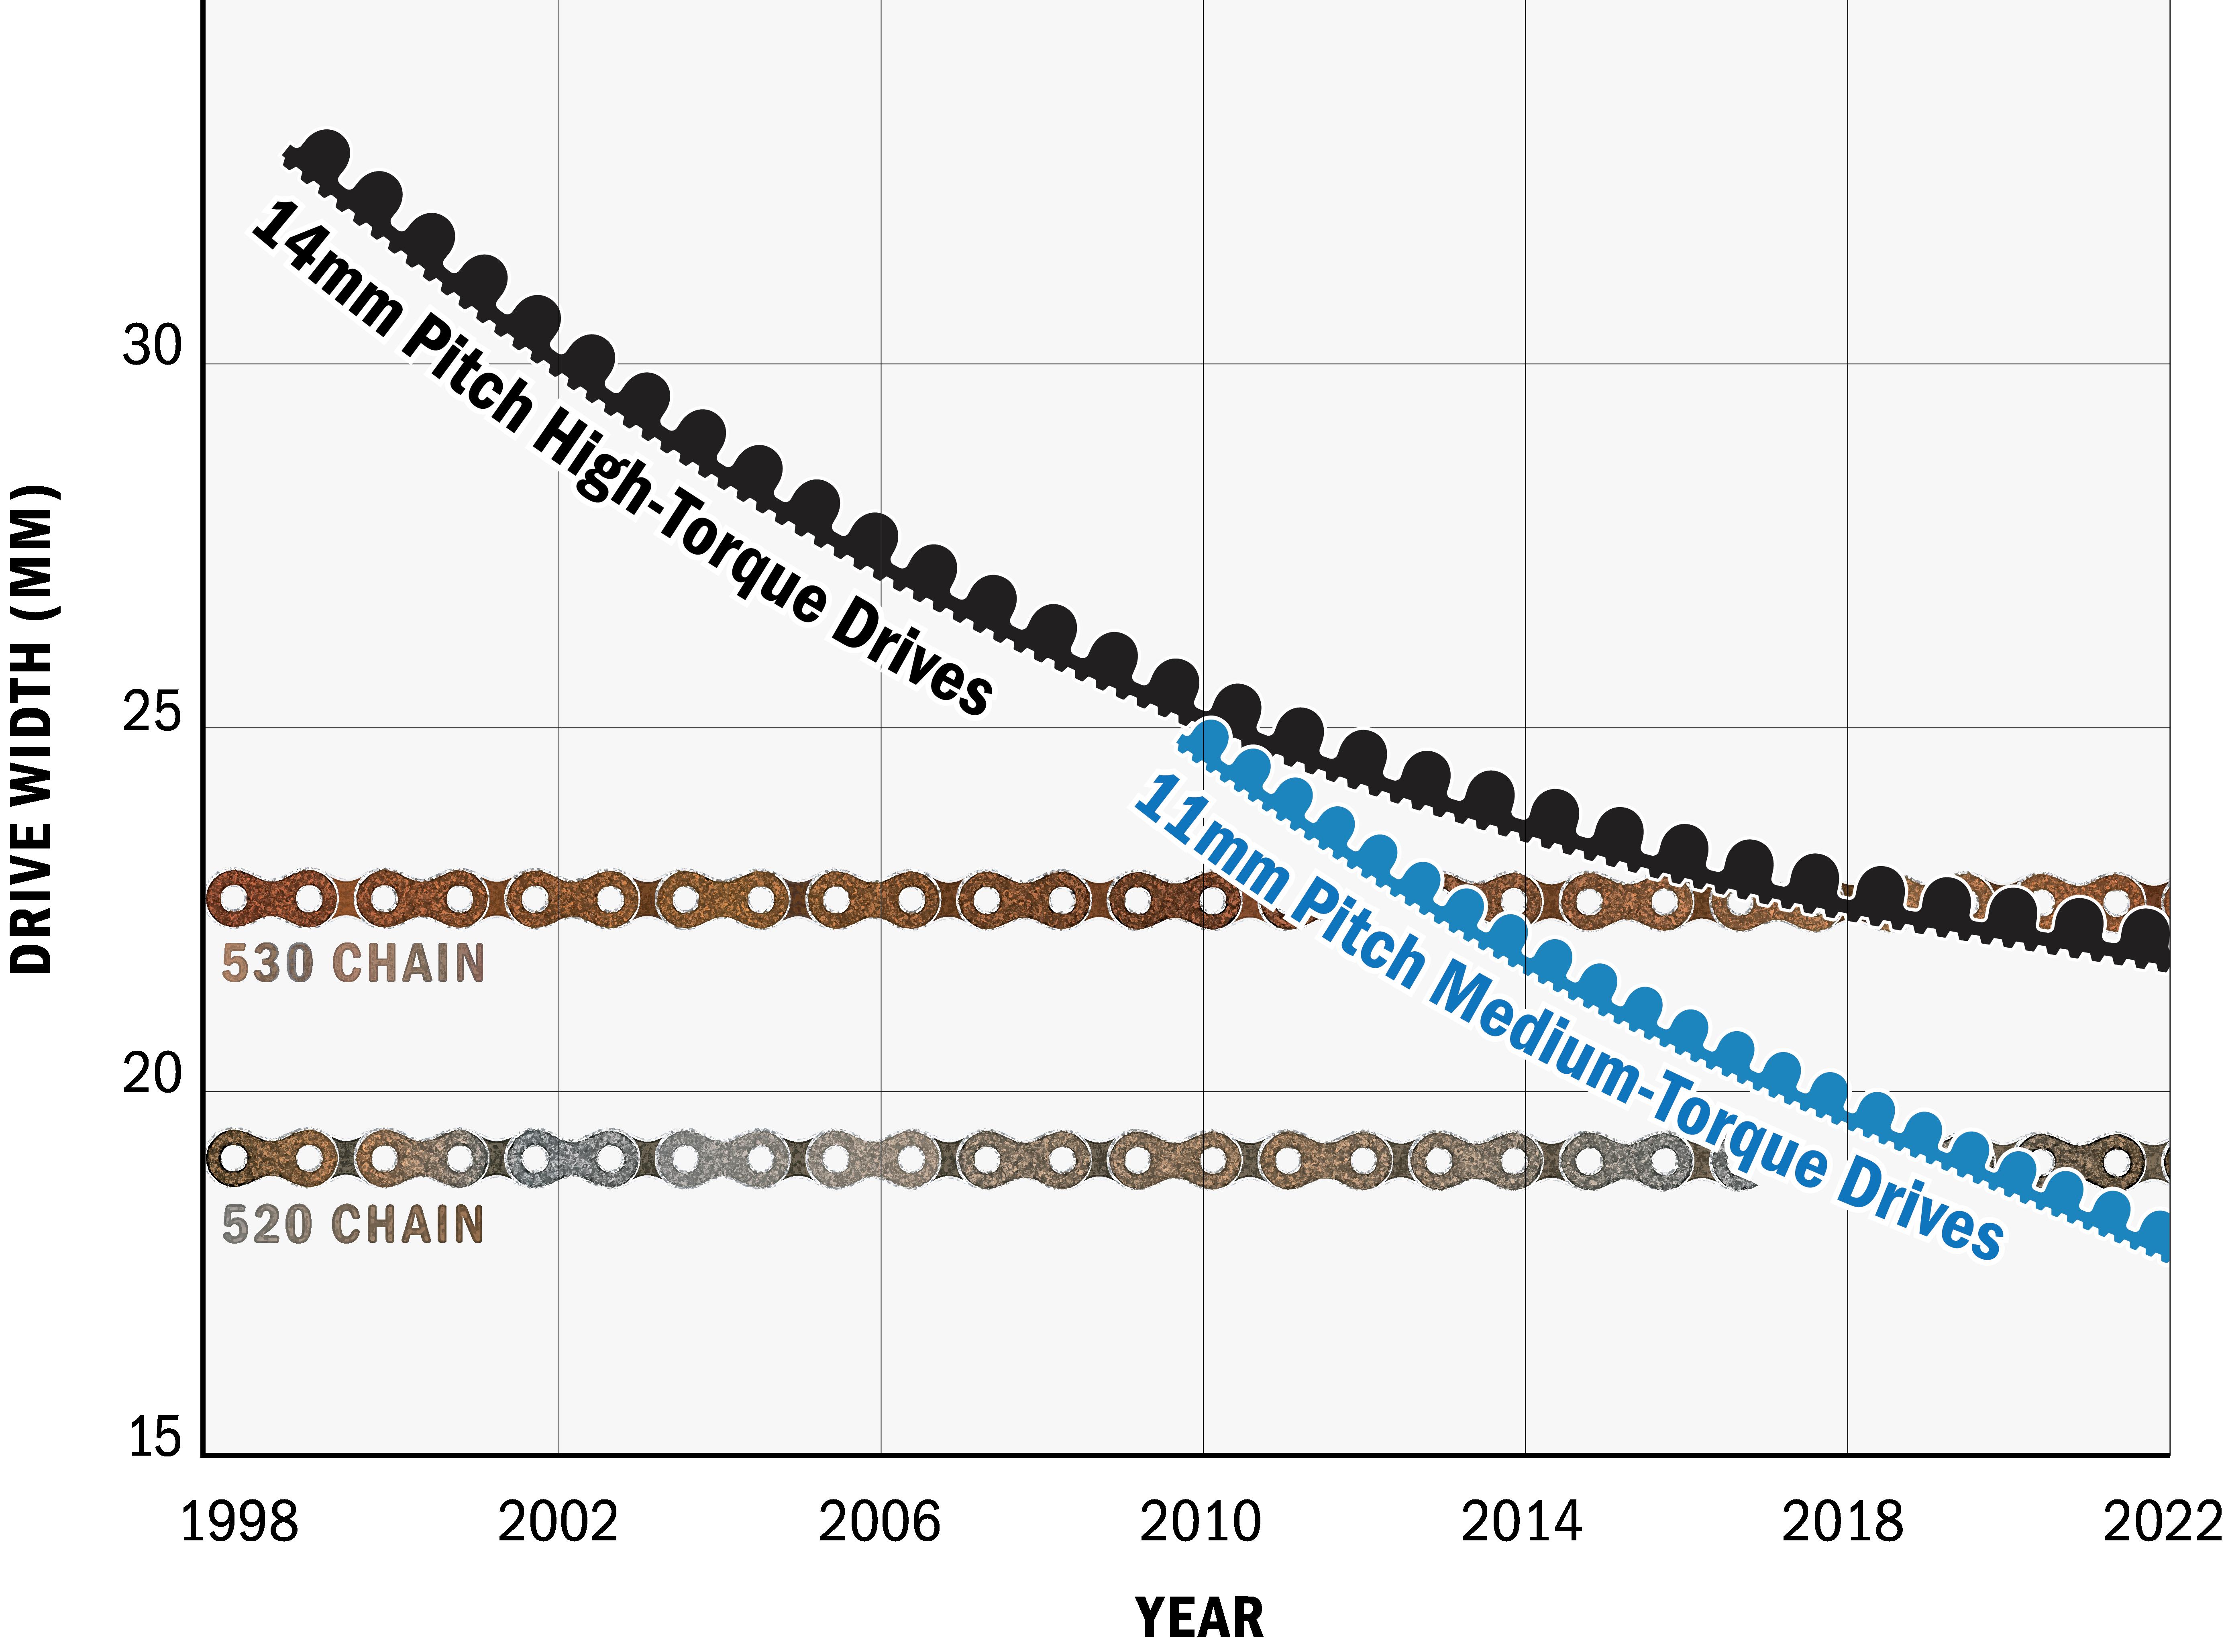 Belt Drive Evolution in Width vs. Chain